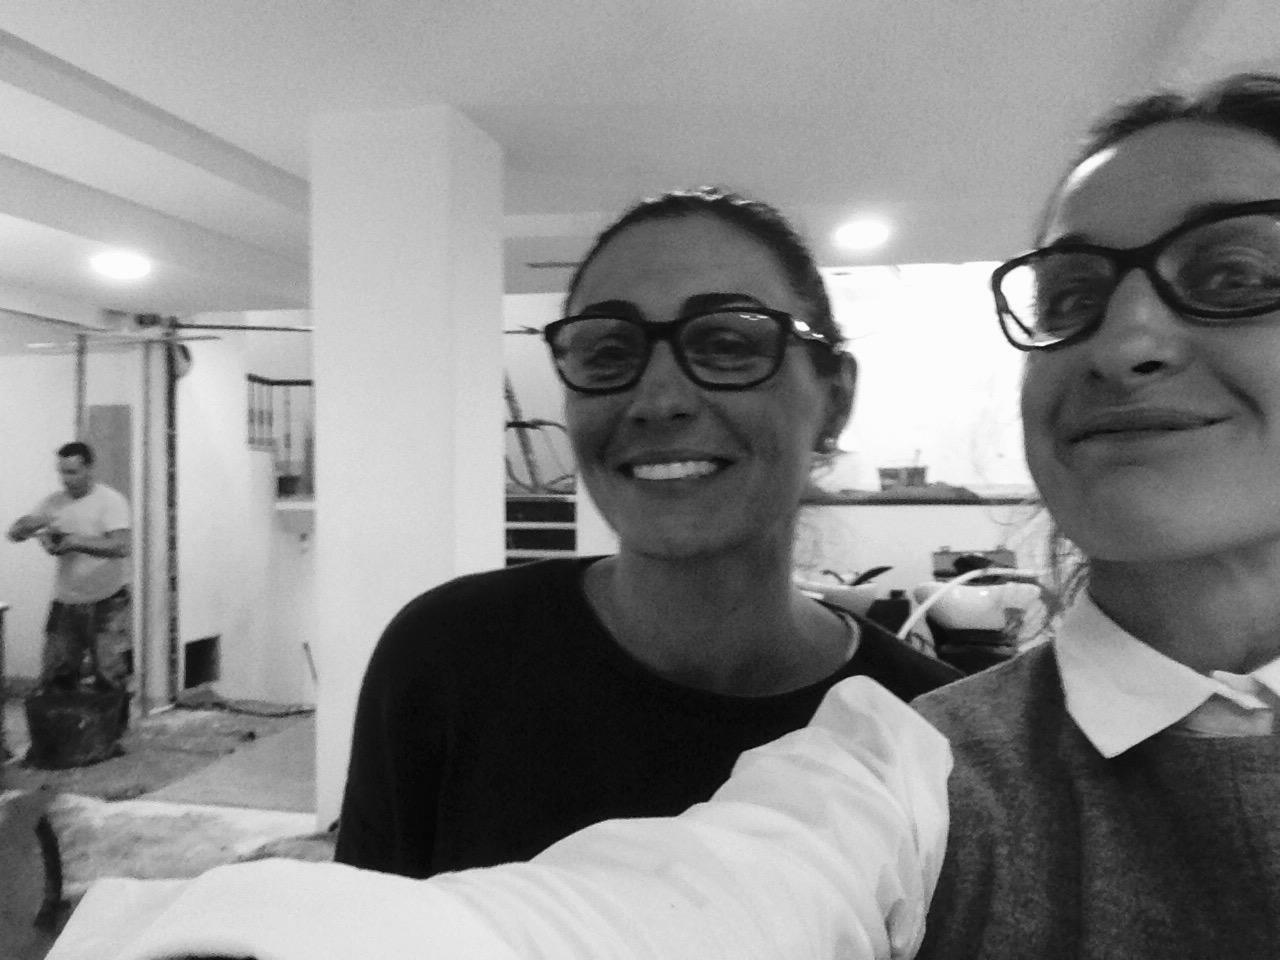 Montse+y+Eva+Marga+Calviño+2017.jpg